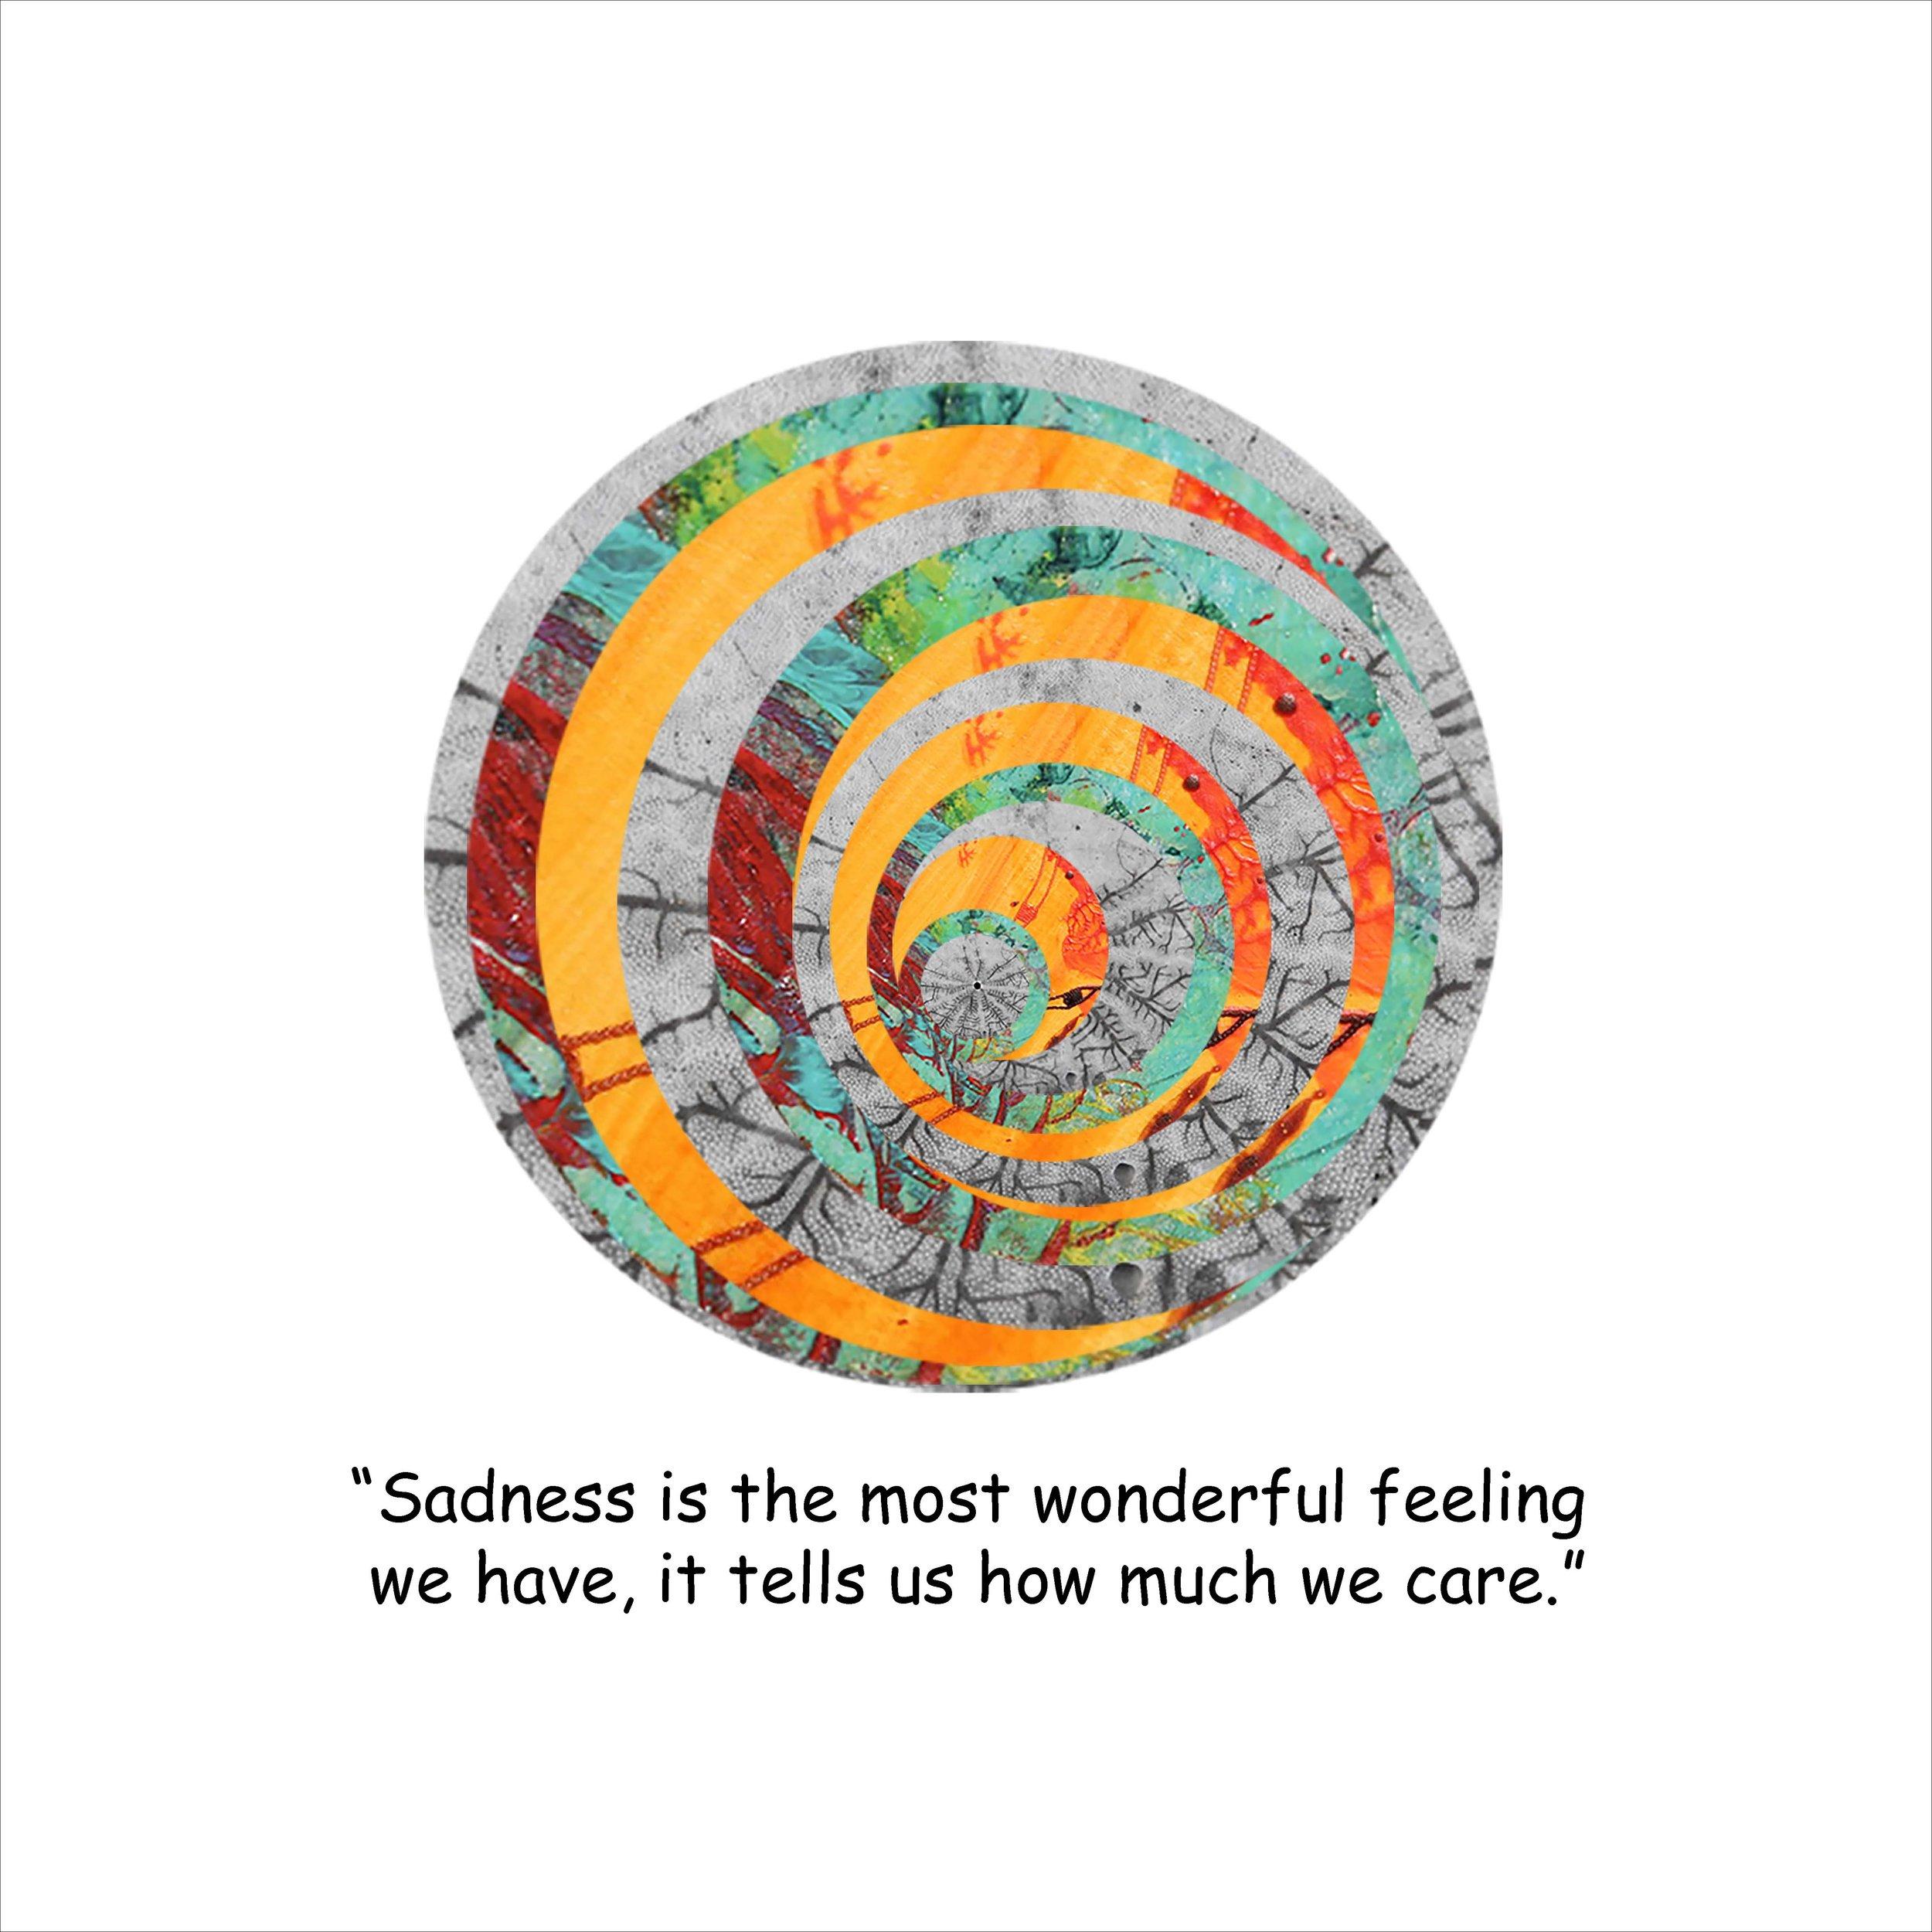 SadnessSaying_10x10_gw.jpg